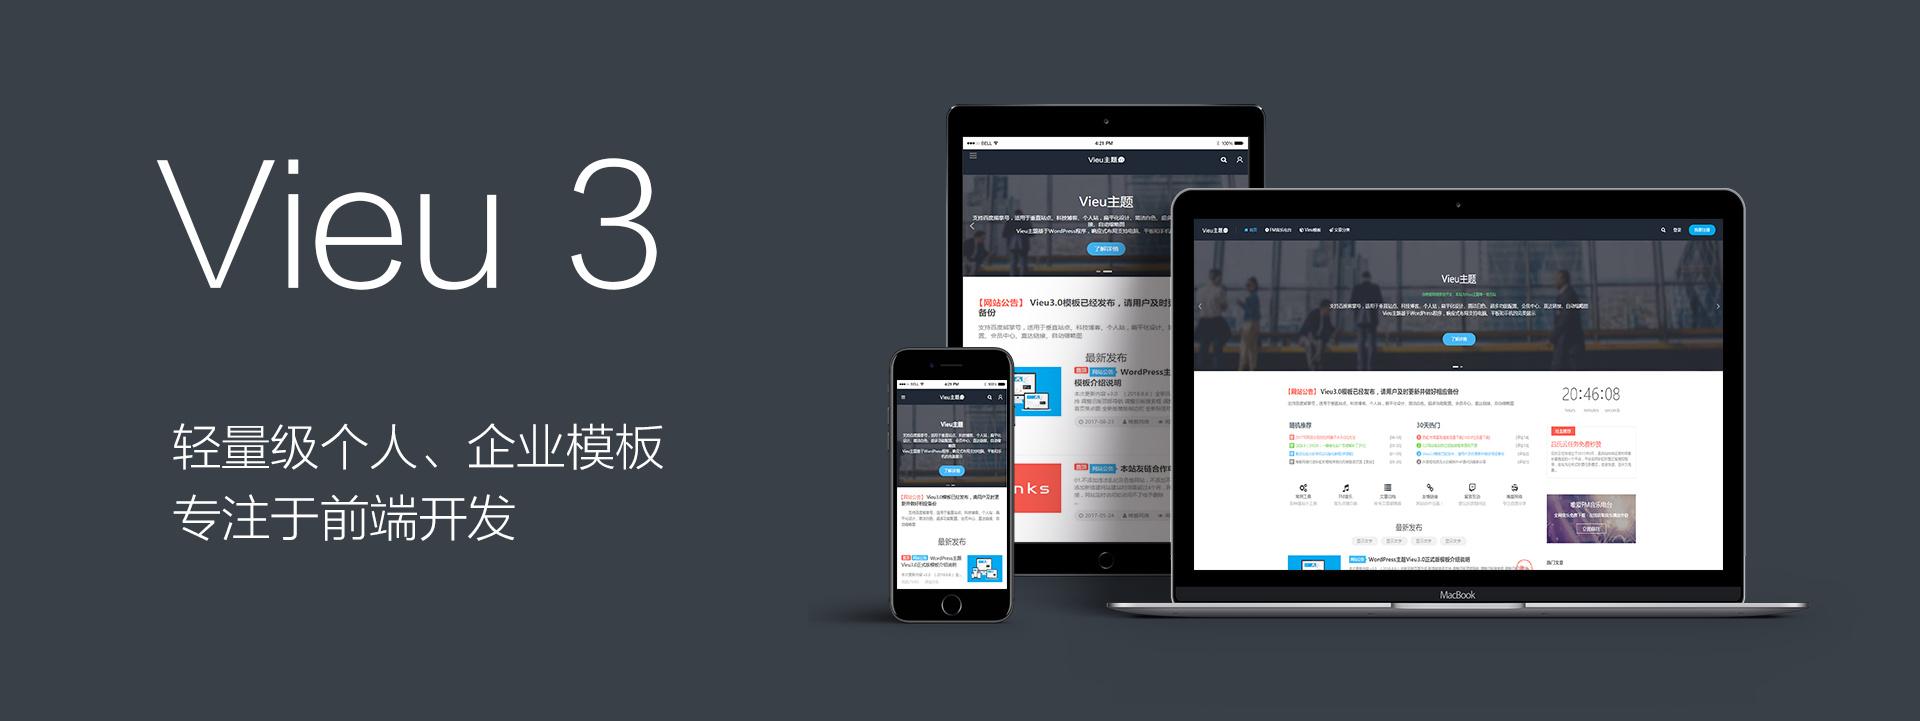 WordPress主题本站自用vieu主题介绍购买(V4增加付费下载功能)